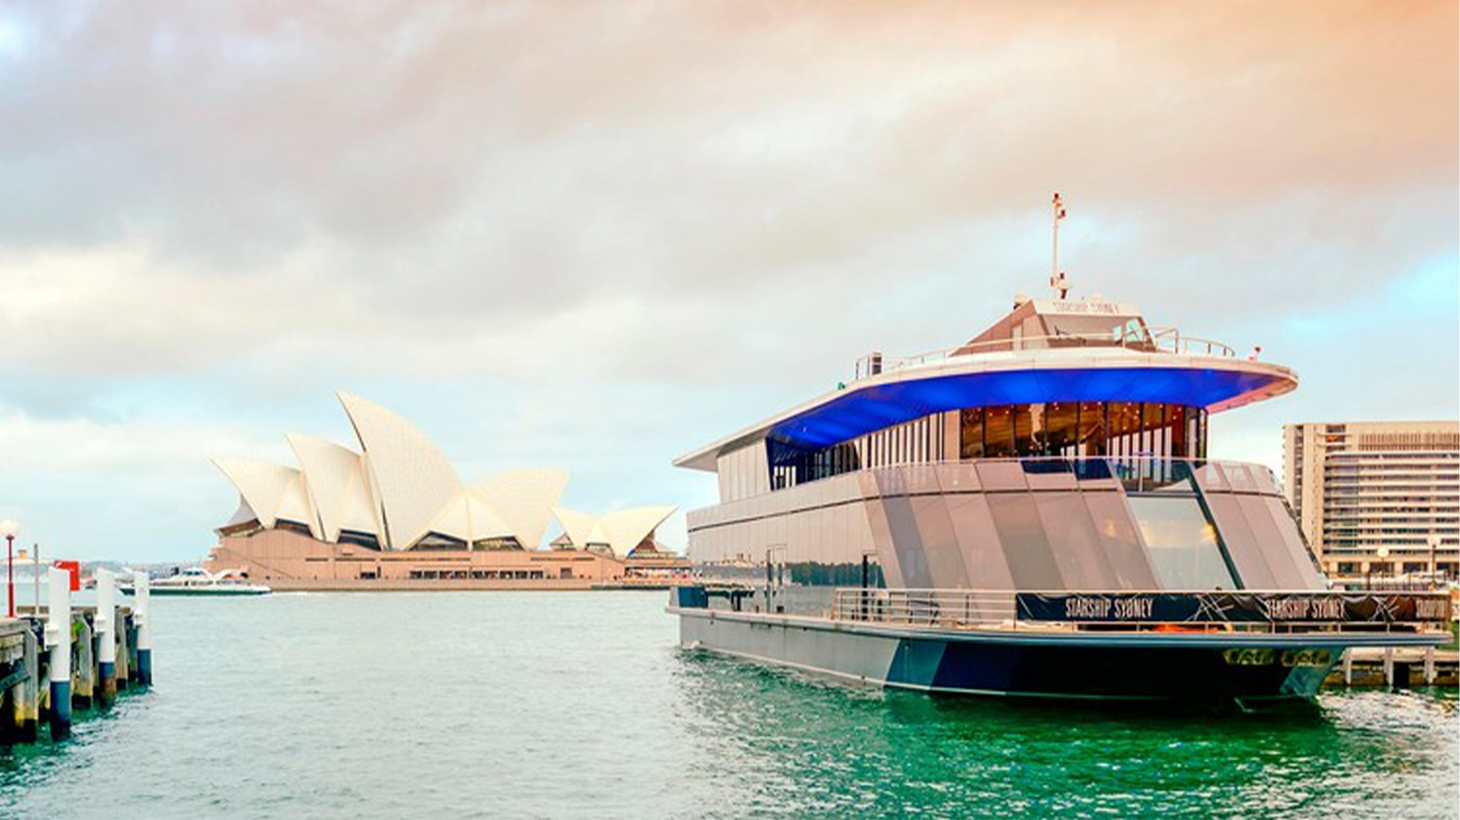 Cruise ship along Sydney Harbour